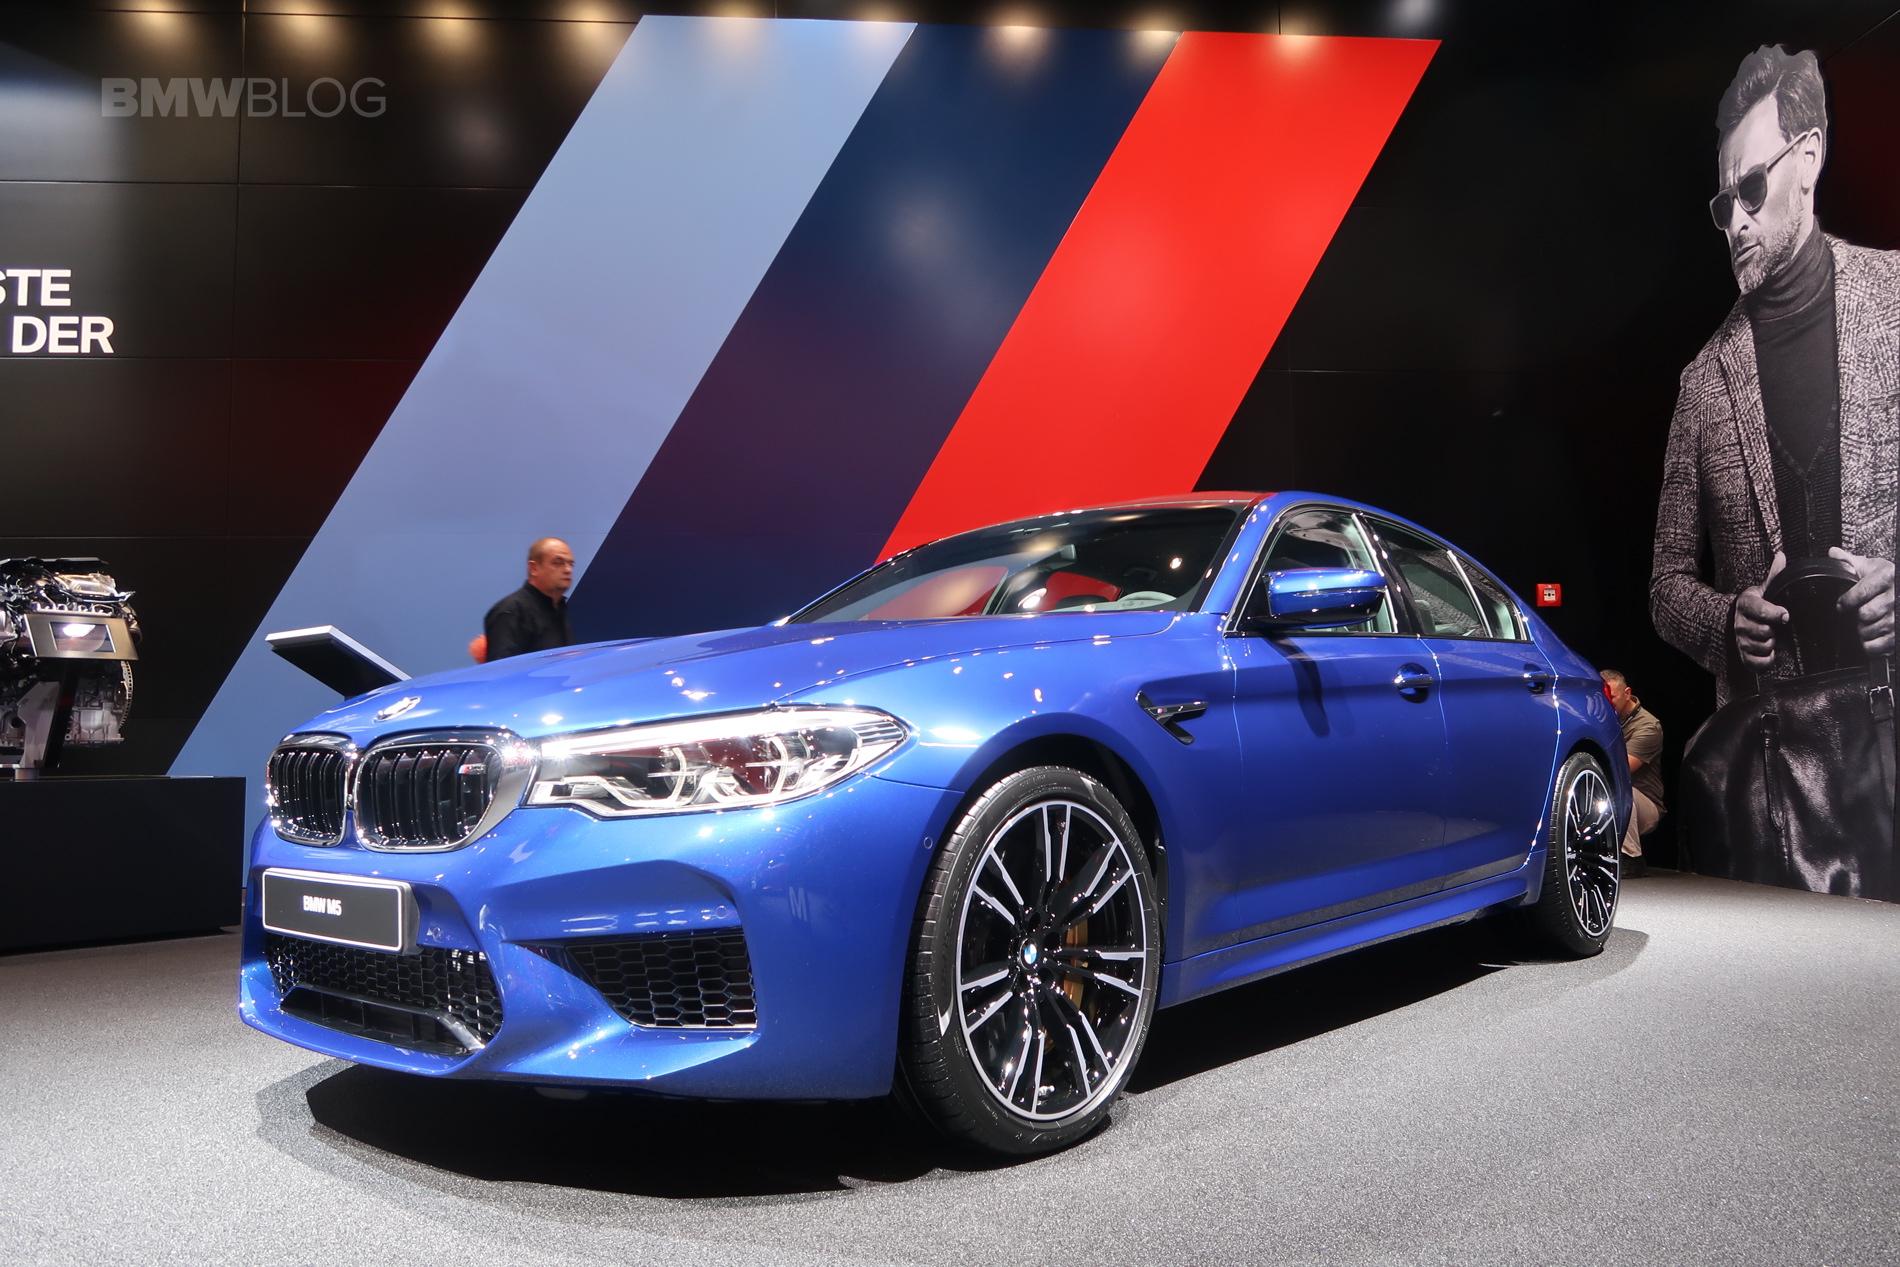 2018 BMW M5 Frankfurt 02